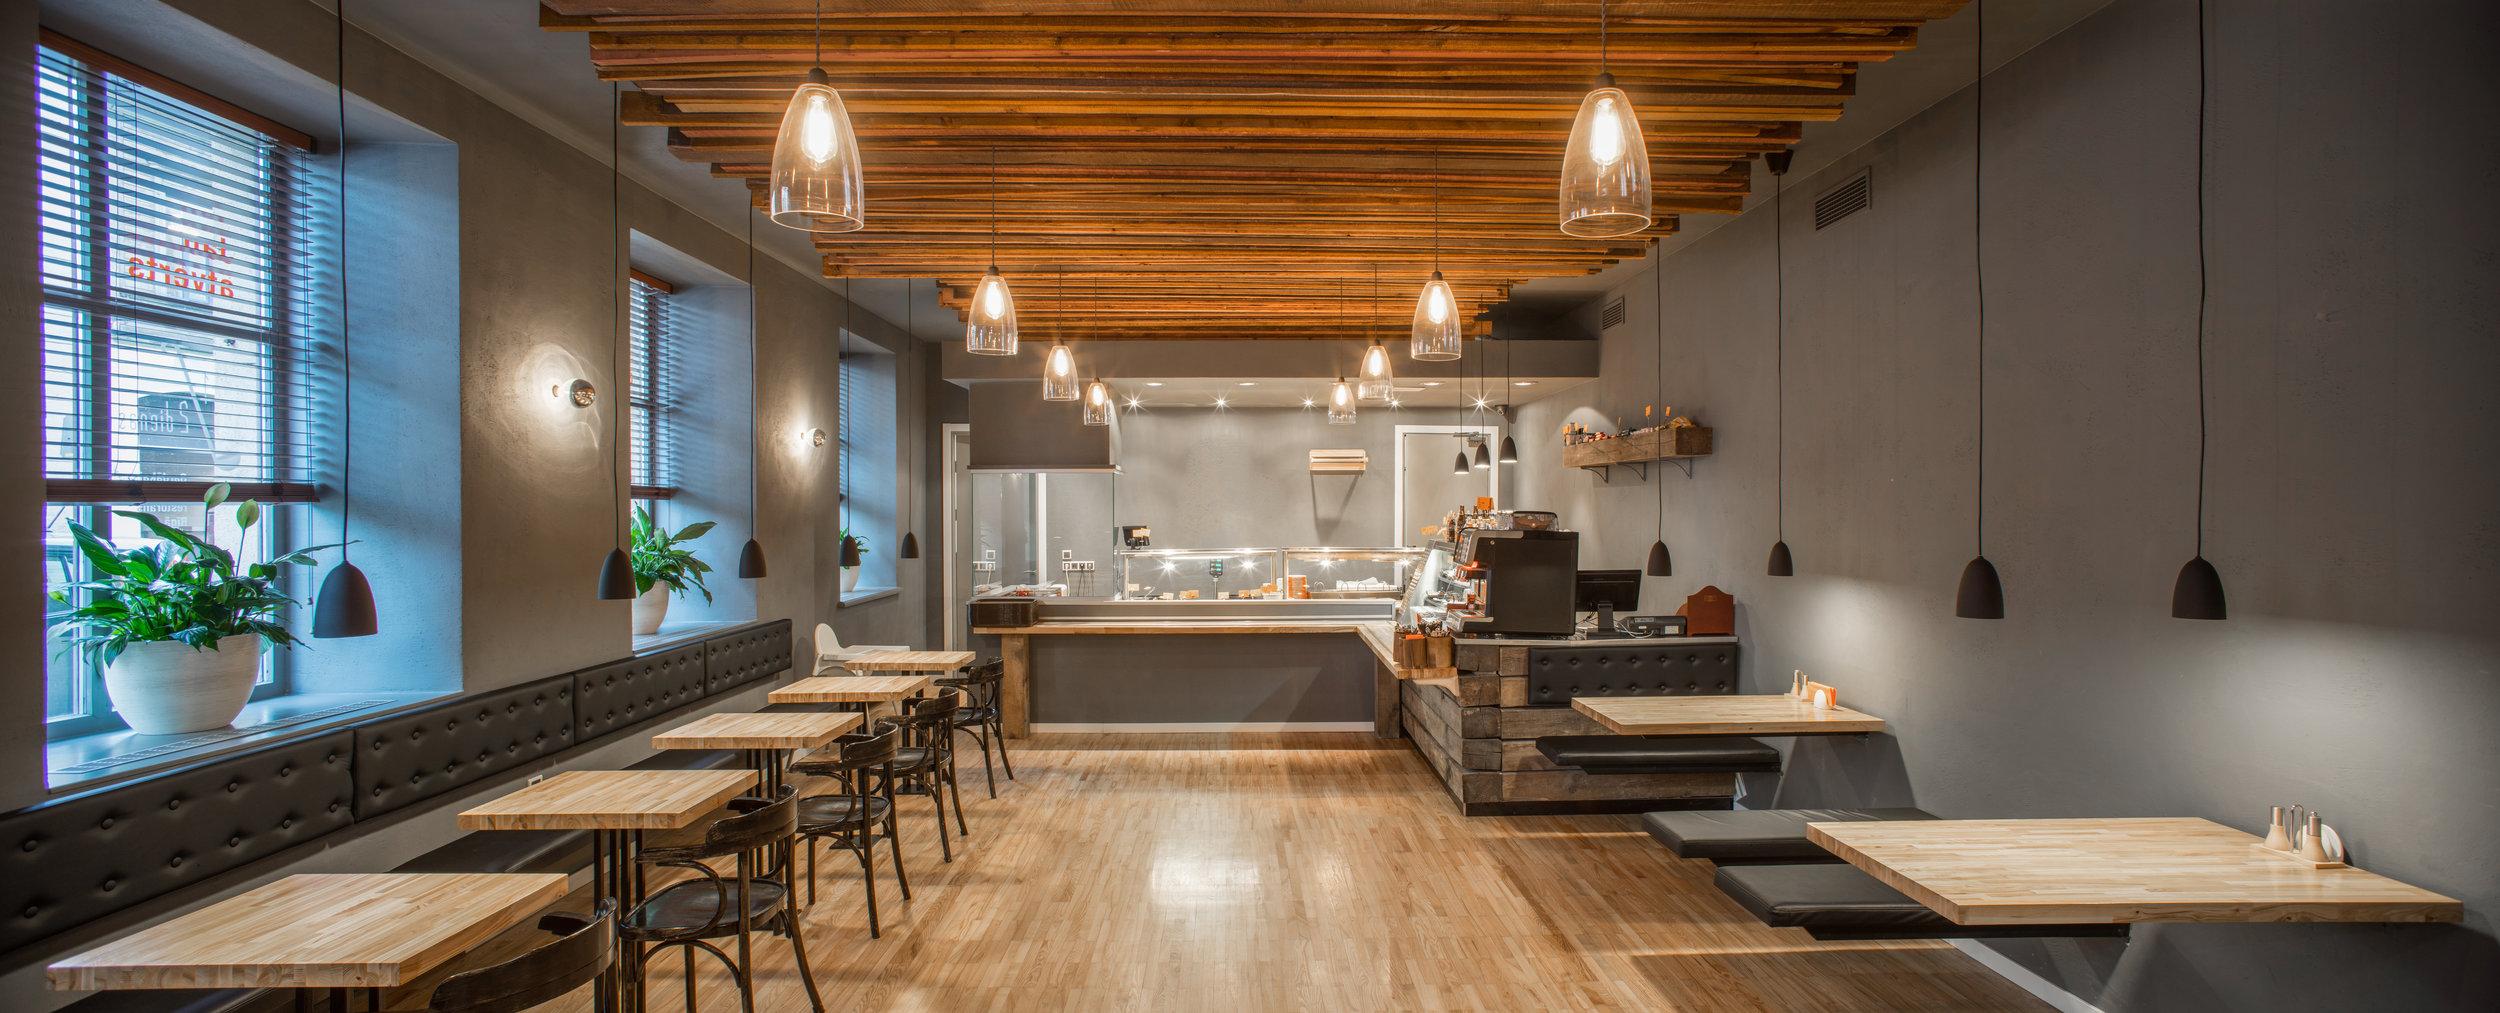 Copy of Interior of restaurant. Panorama. Wooden design.